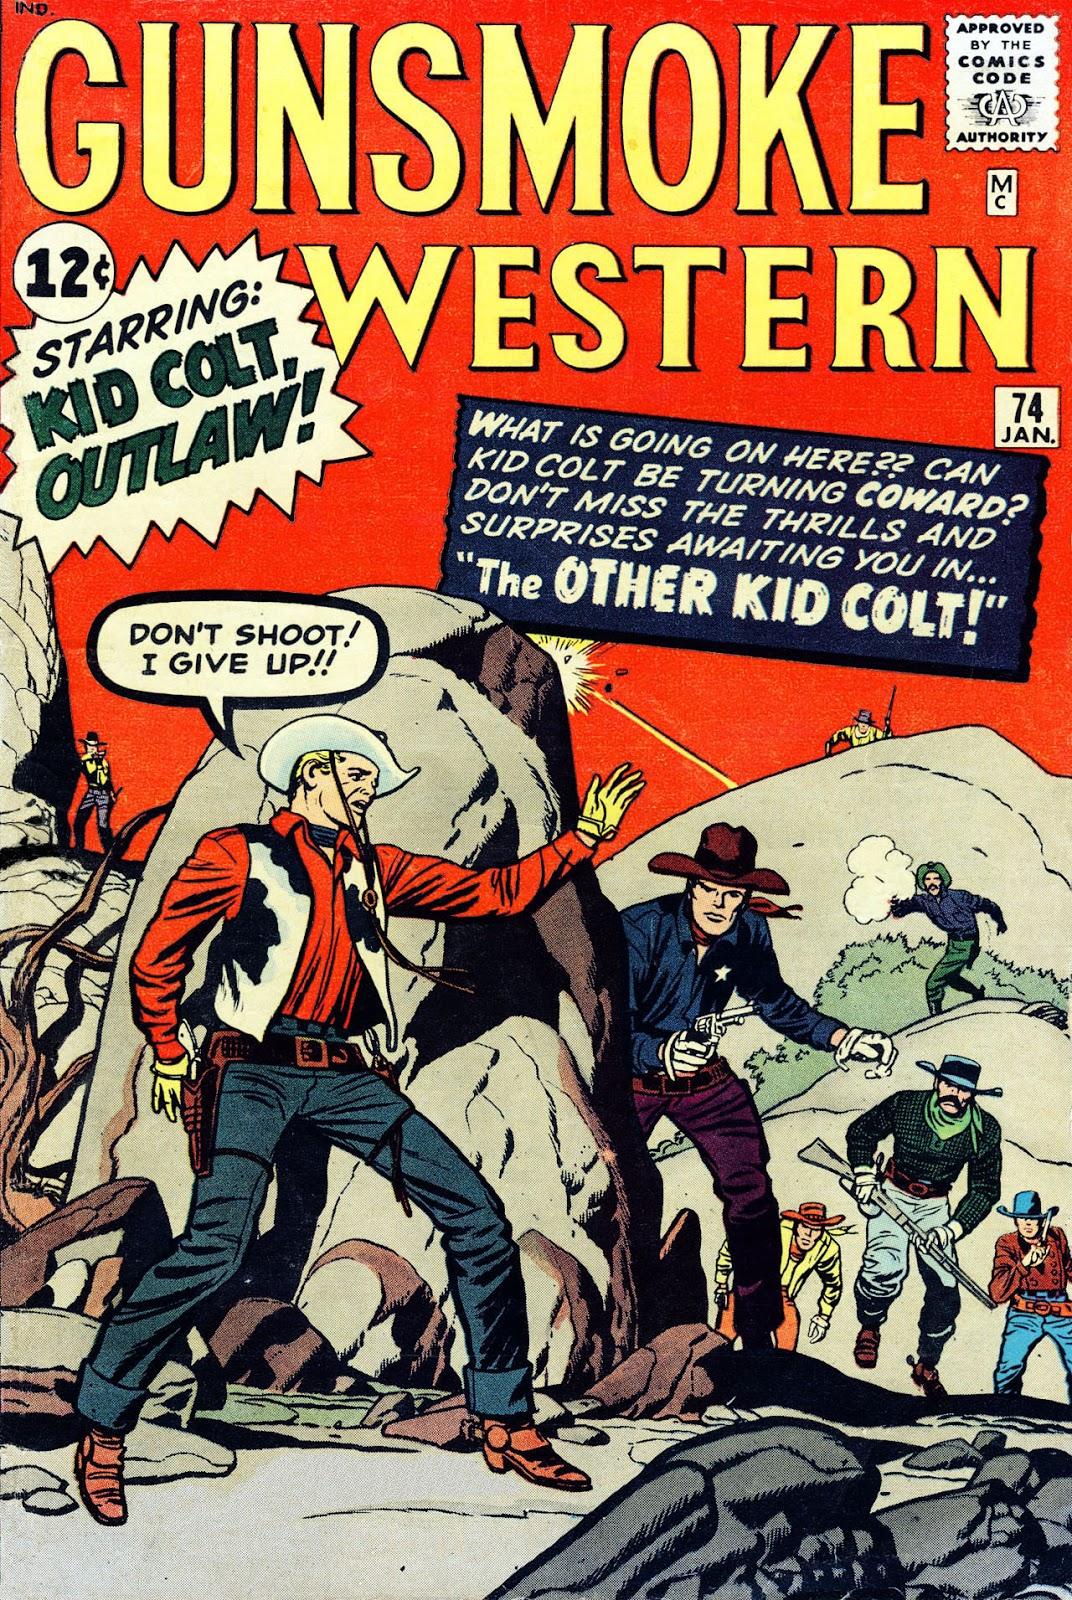 Gunsmoke Western issue 74 - Page 1